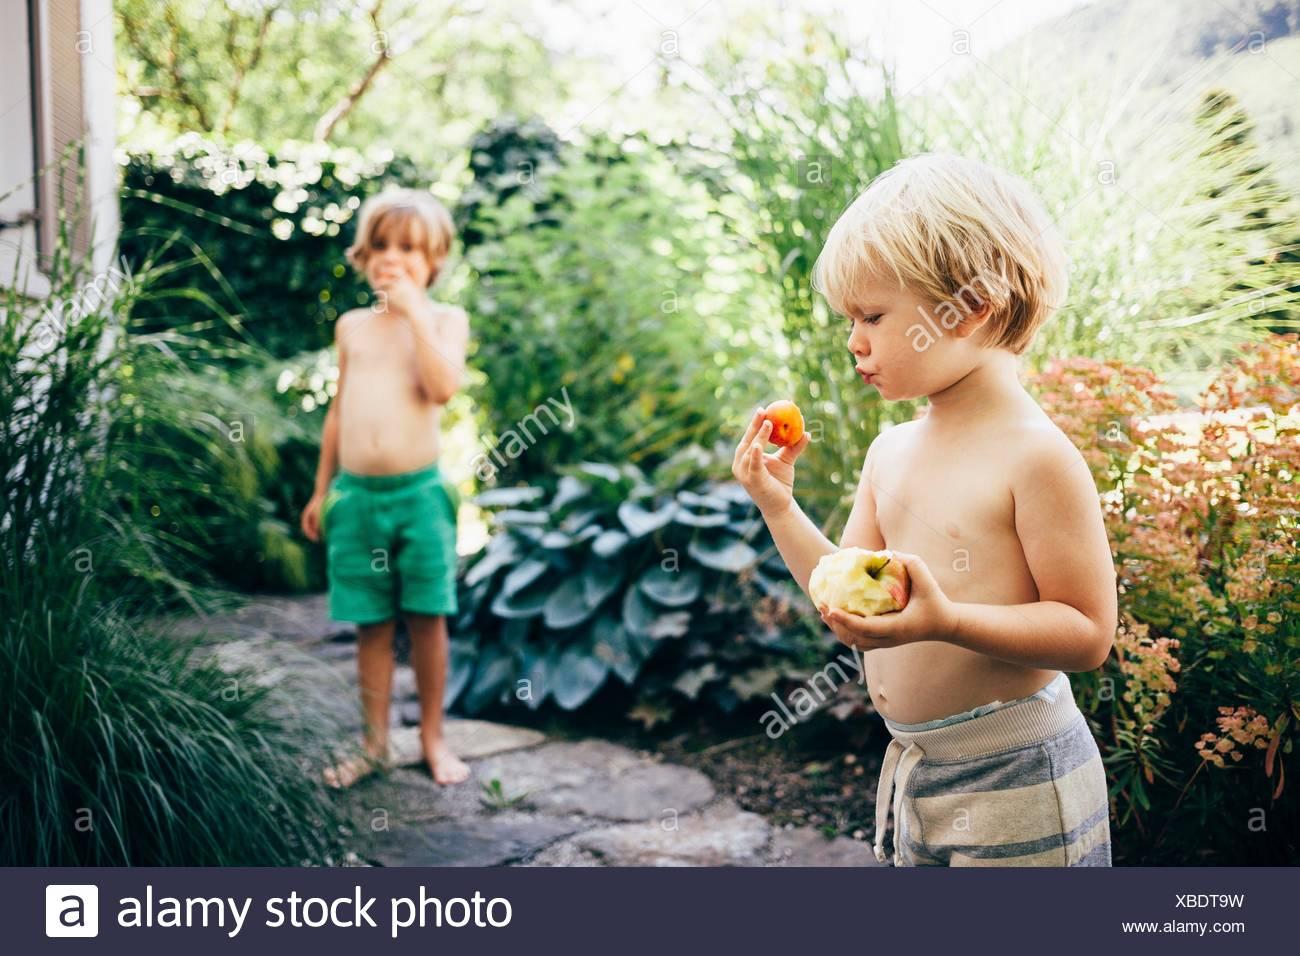 Boys on garden path eating apples and oranges, Bludenz, Vorarlberg, Austria - Stock Image